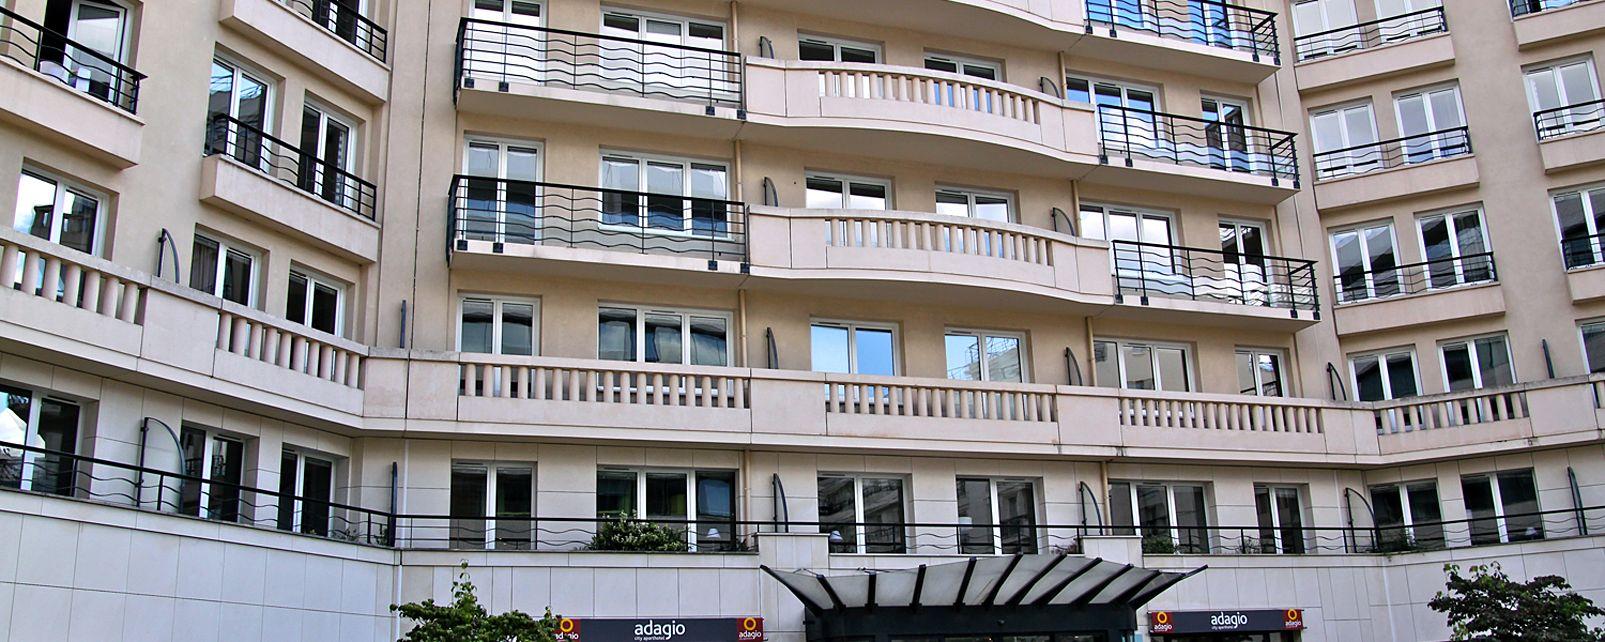 hotel adagio city apartporte de versailles issy les moulineaux. Black Bedroom Furniture Sets. Home Design Ideas